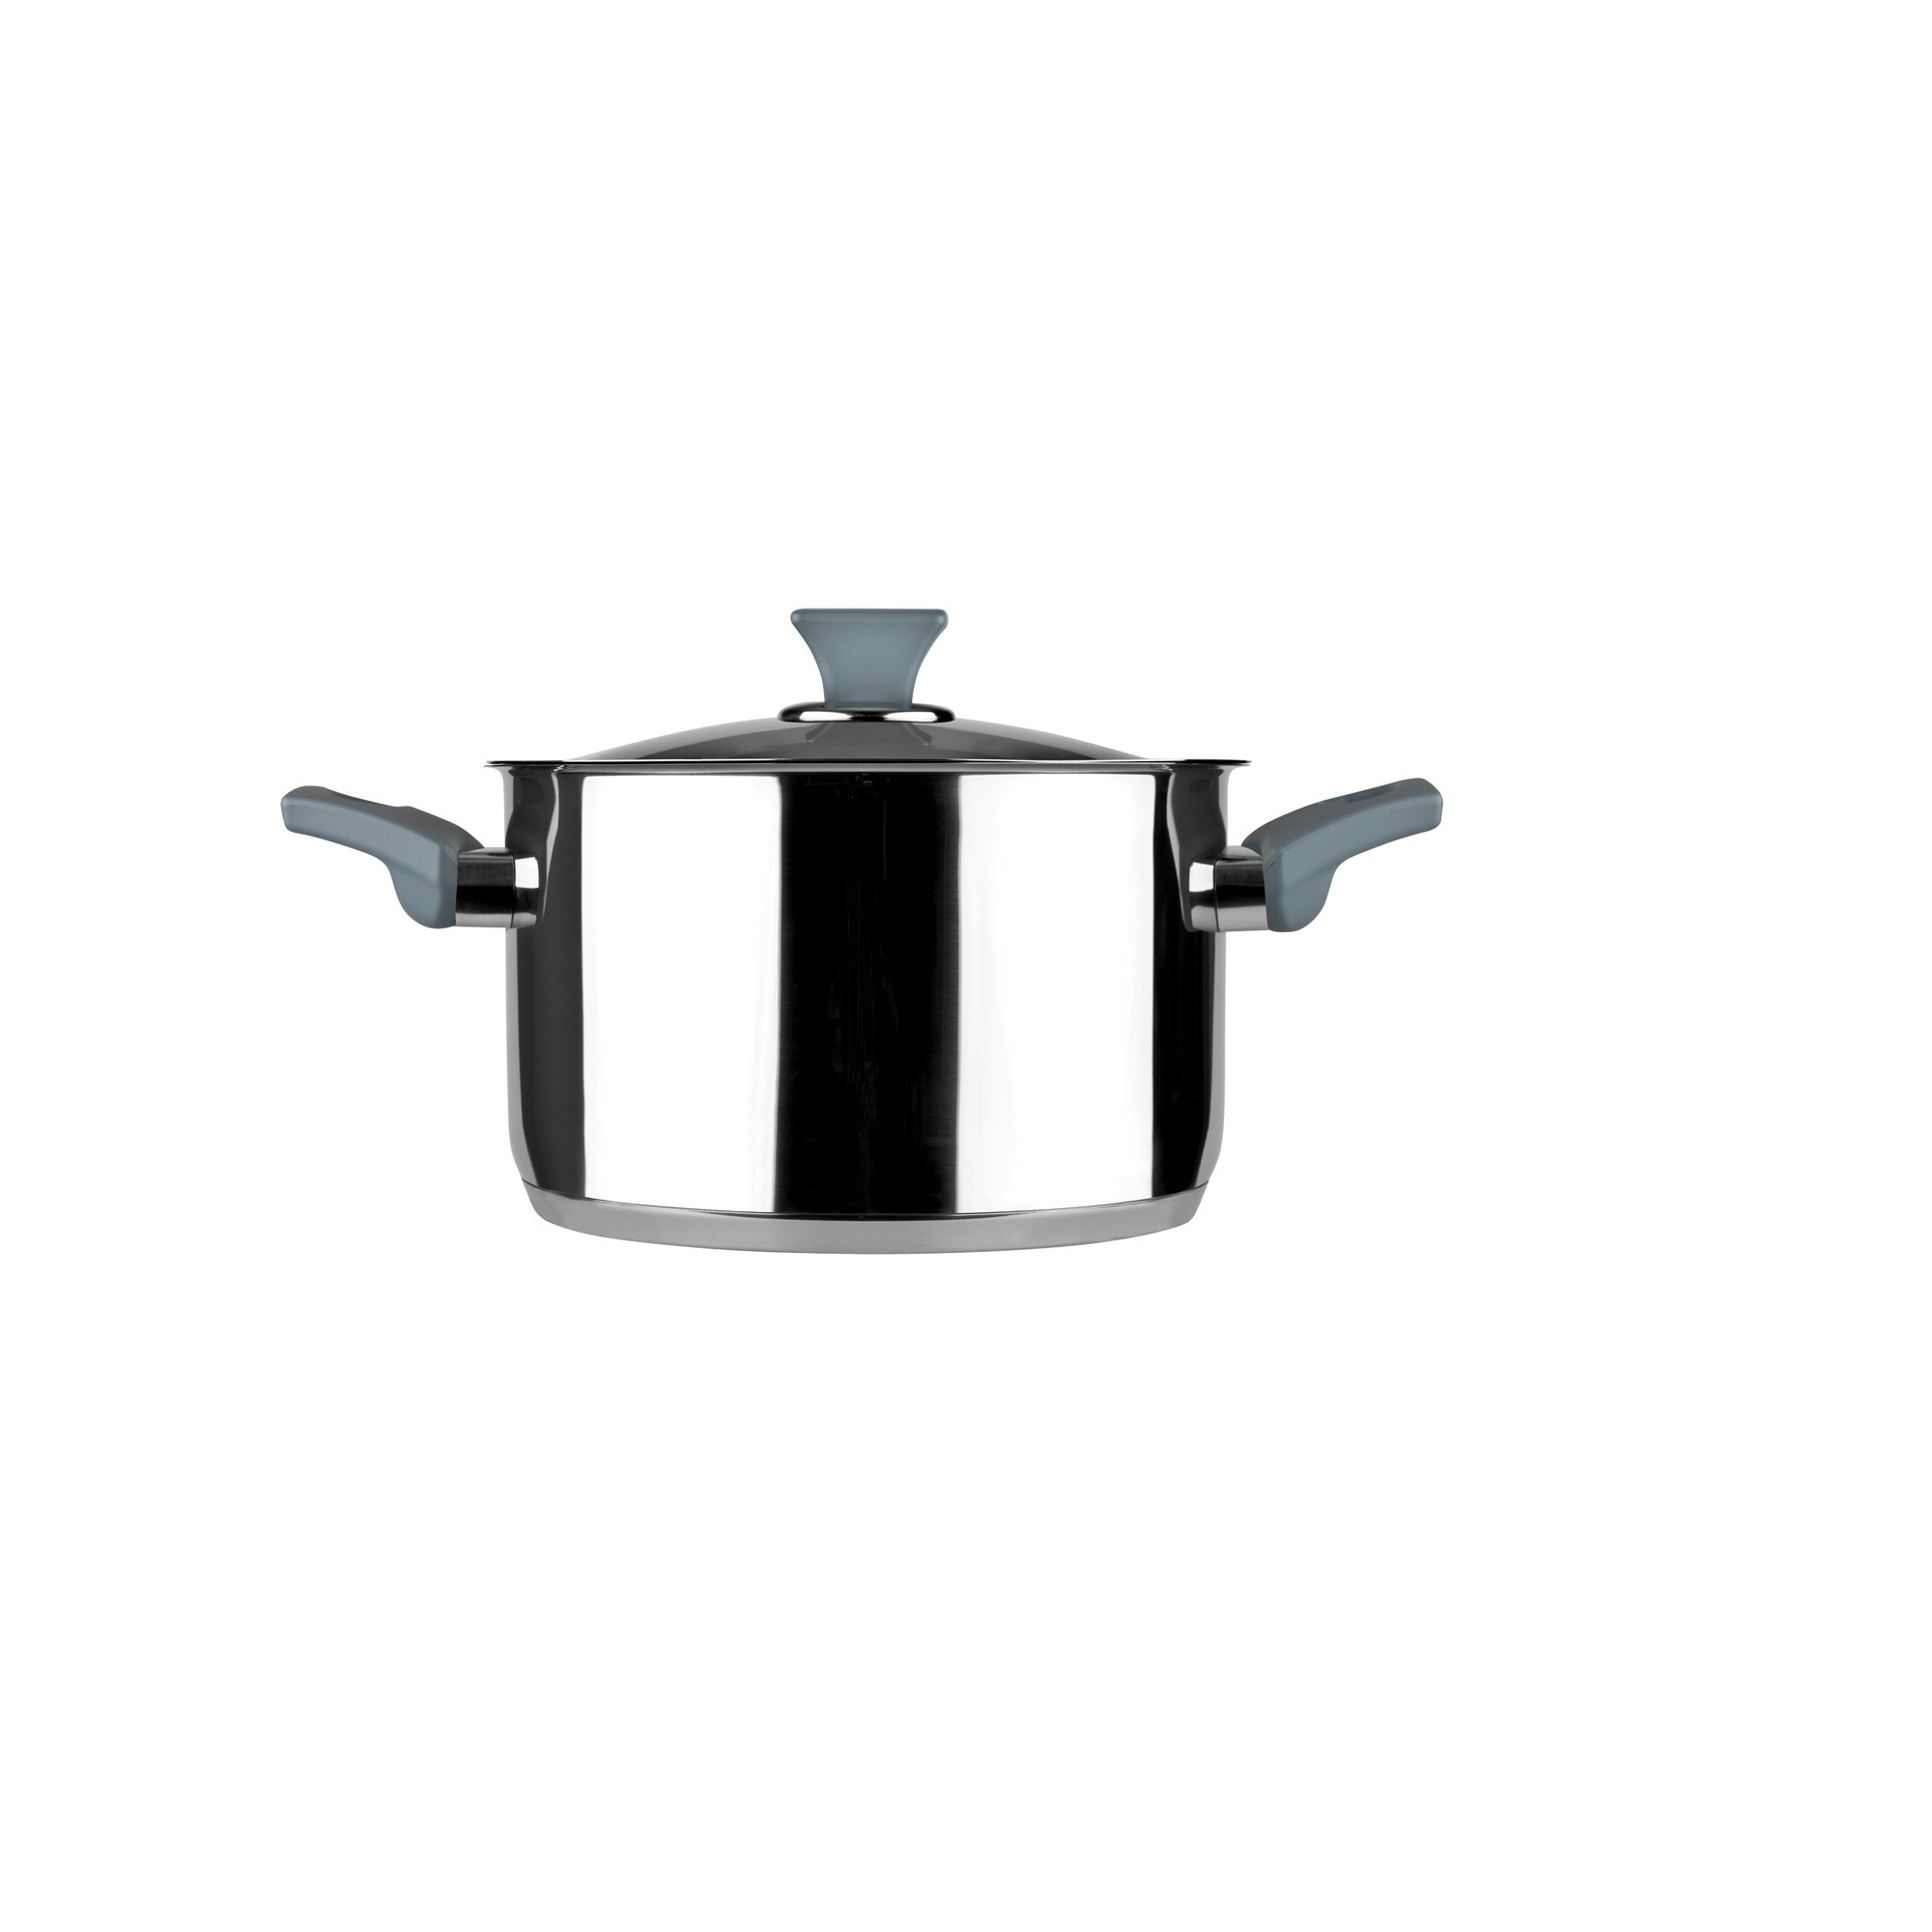 Xύτρα Fest 24cm Family Inox 18/10 home   σκευη μαγειρικης   κατσαρόλες χύτρες